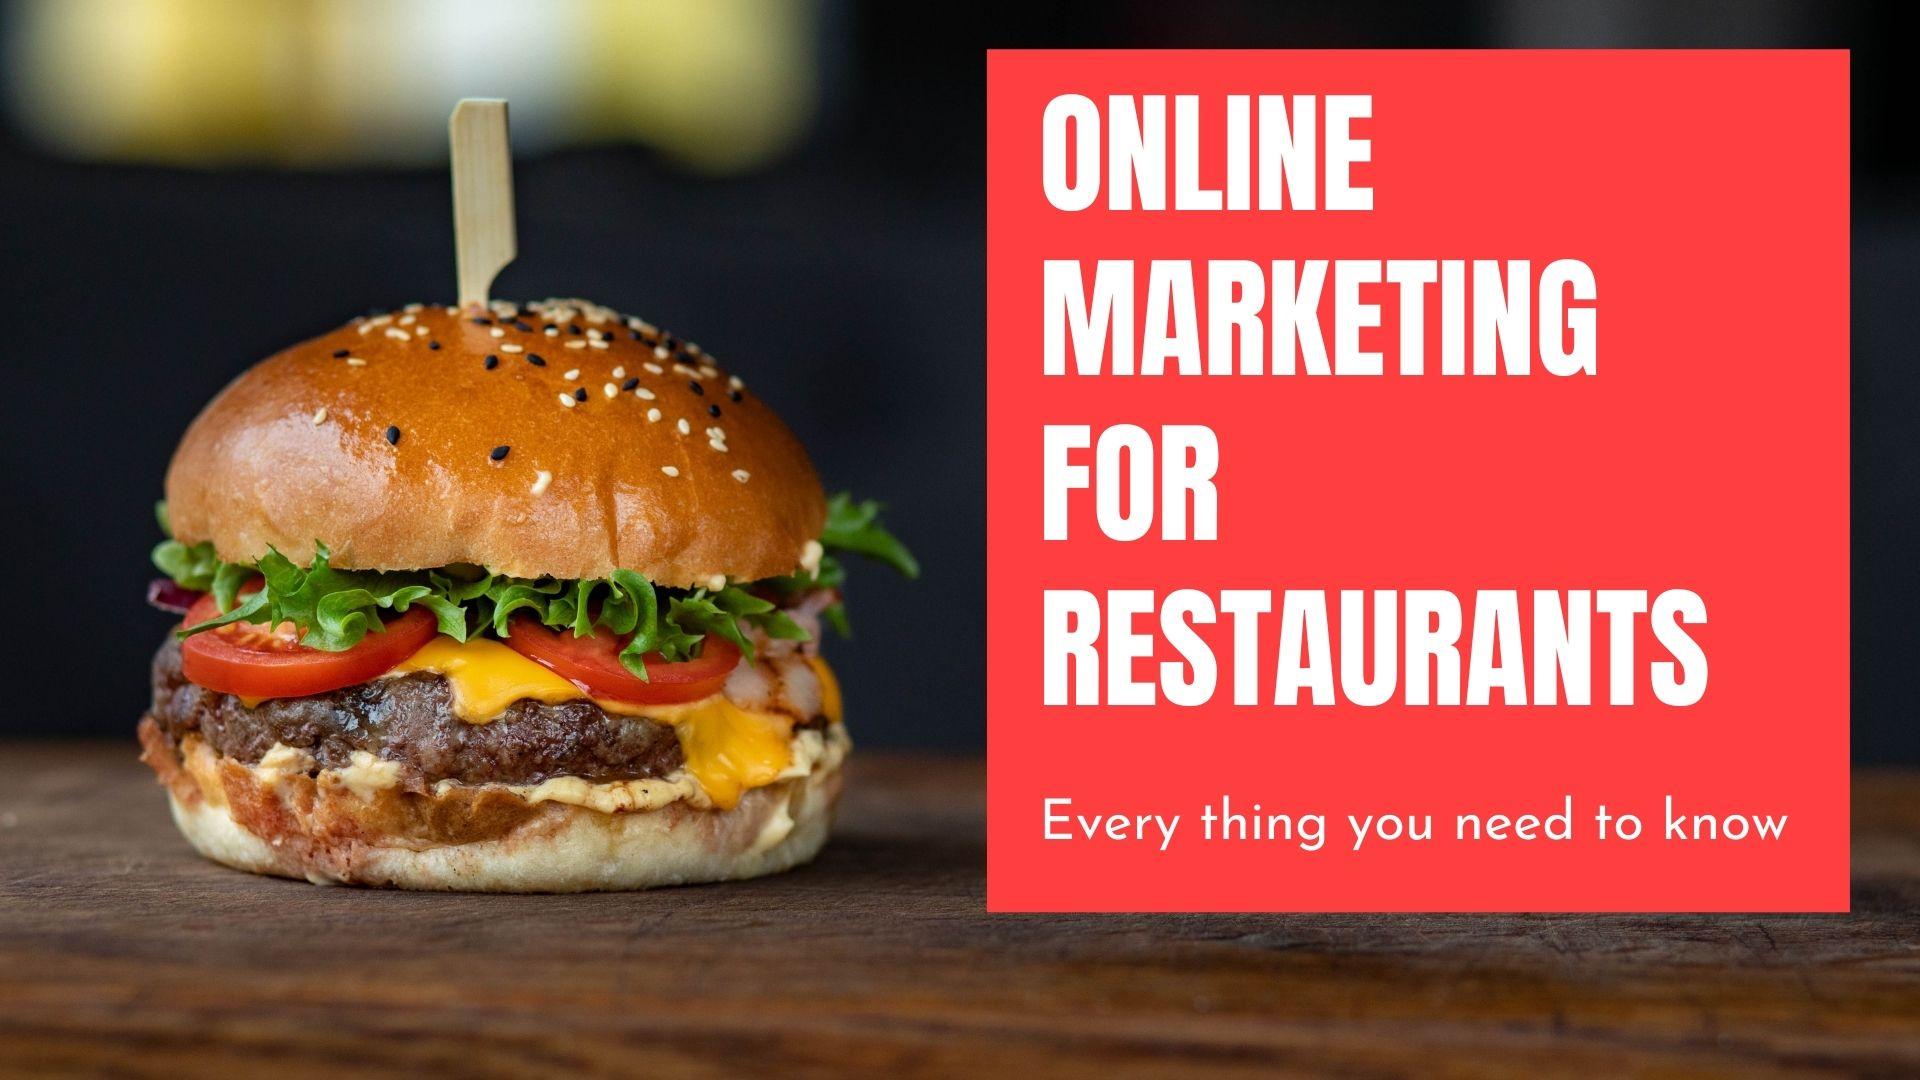 Online Marketing Tips for Restaurants: Digital Strategies 2021